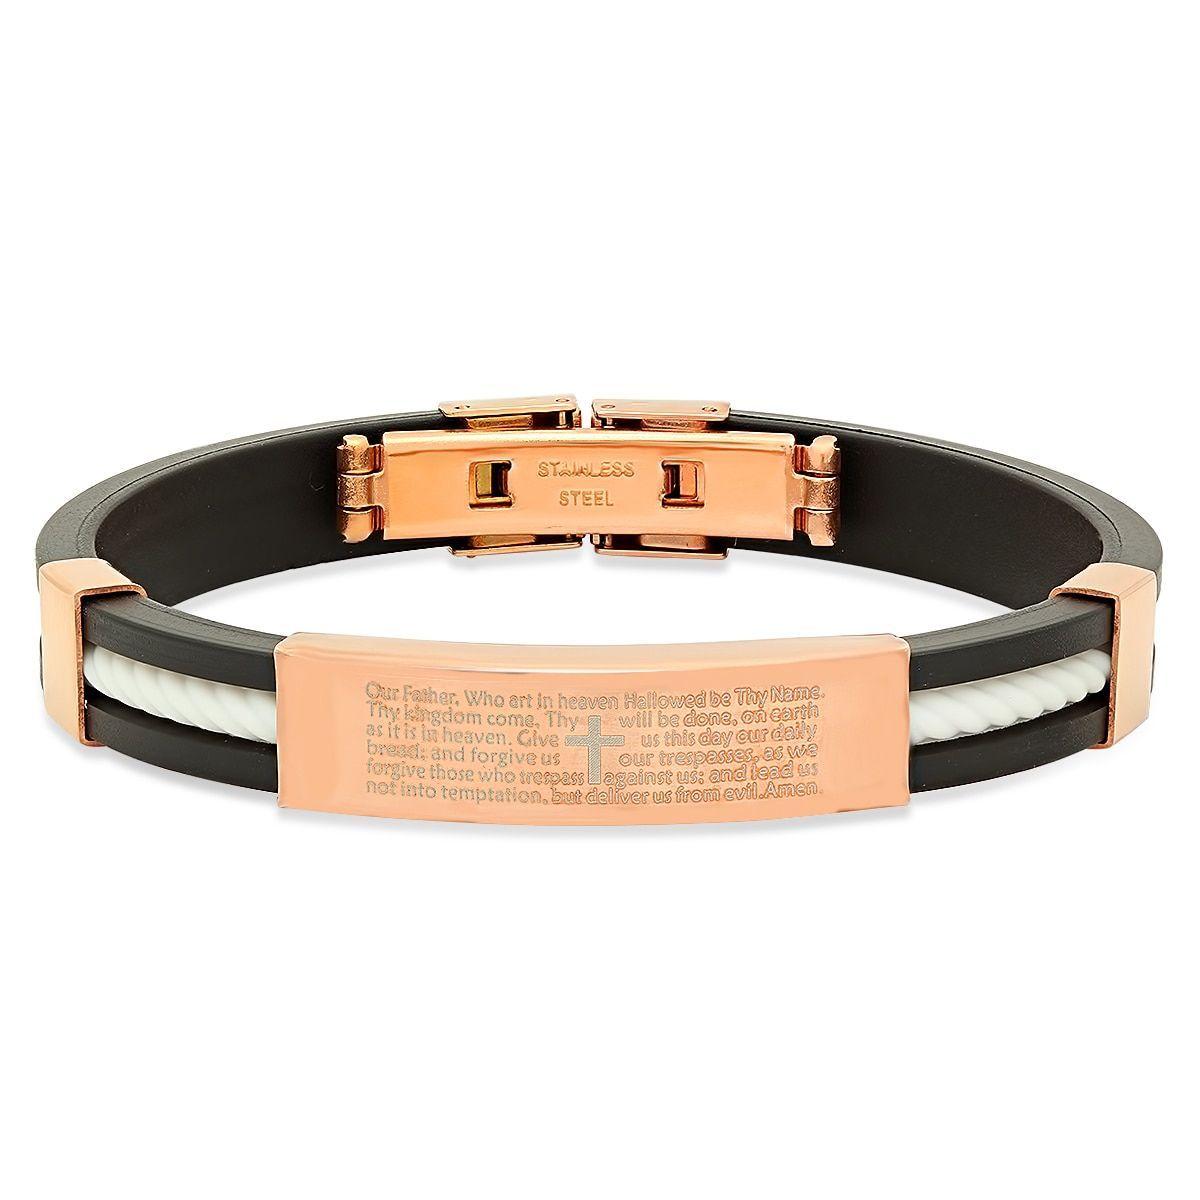 18k Rose Gold-plated 'Our Father' Prayer Bracelet (Orange and Black), Men's, Size: 8 Inch, Pink